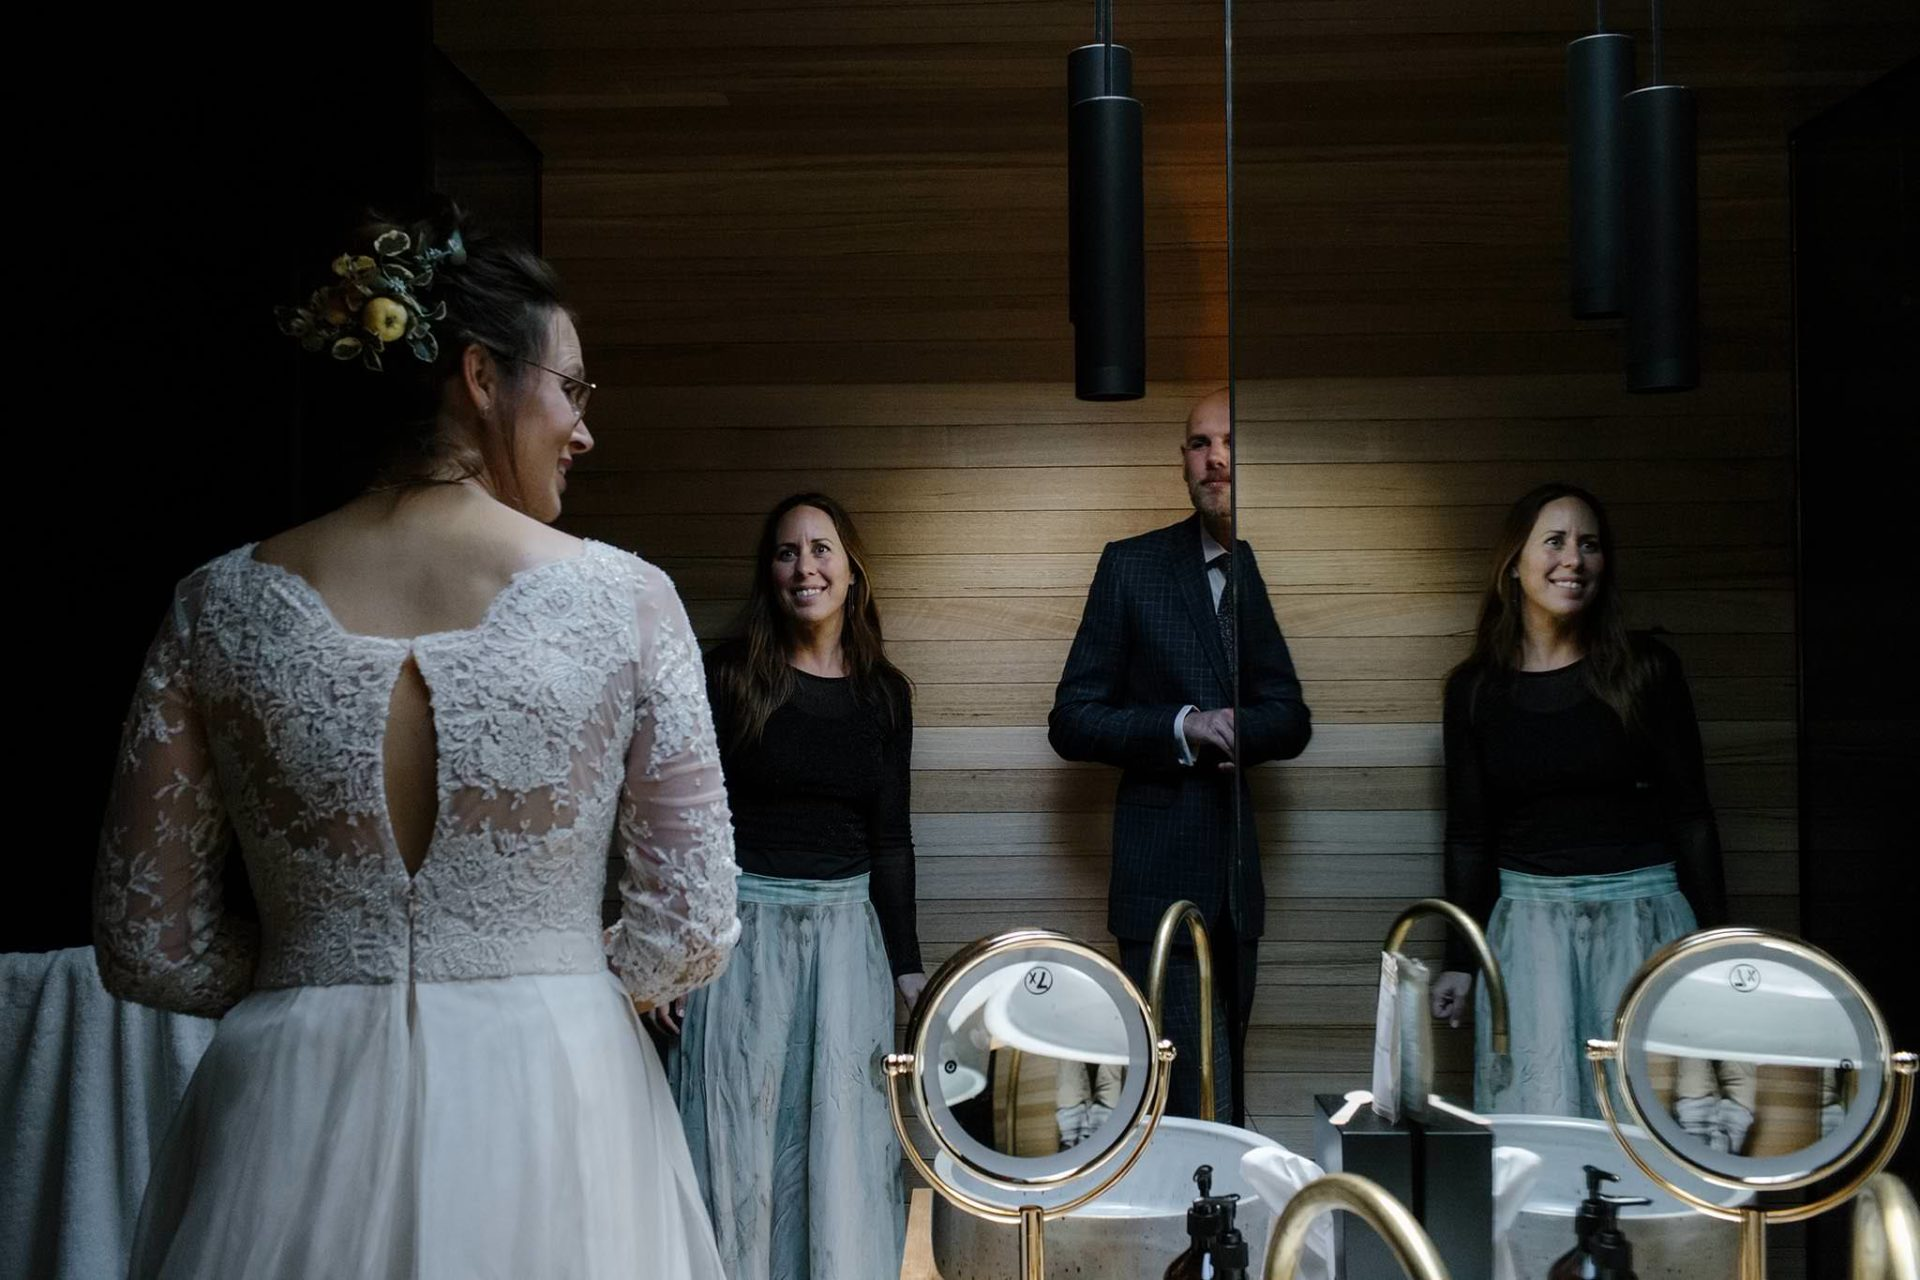 marriage celebrant tasmania-elopement pumphouse point-merren wilkinson-cinta celebrate love-wedding vows